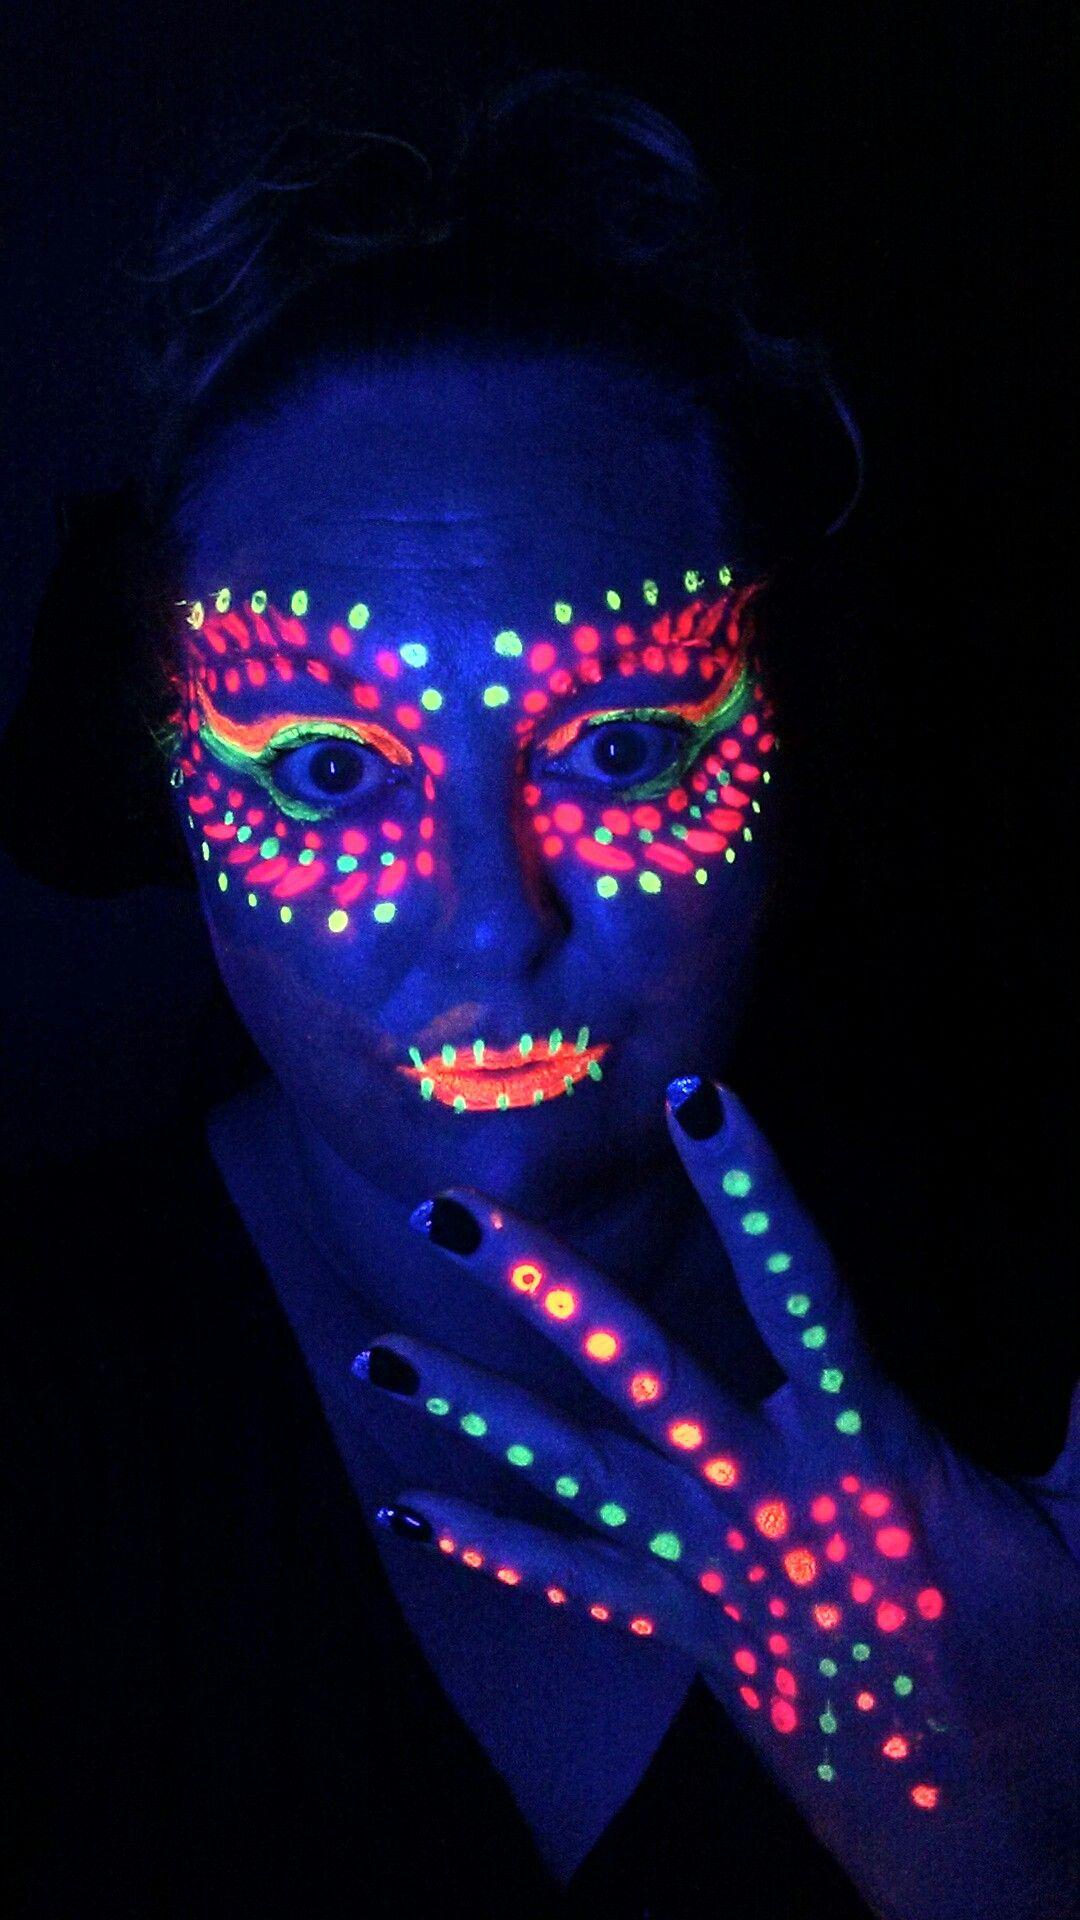 Blacklight makeup idea   Neon face paint, Uv makeup